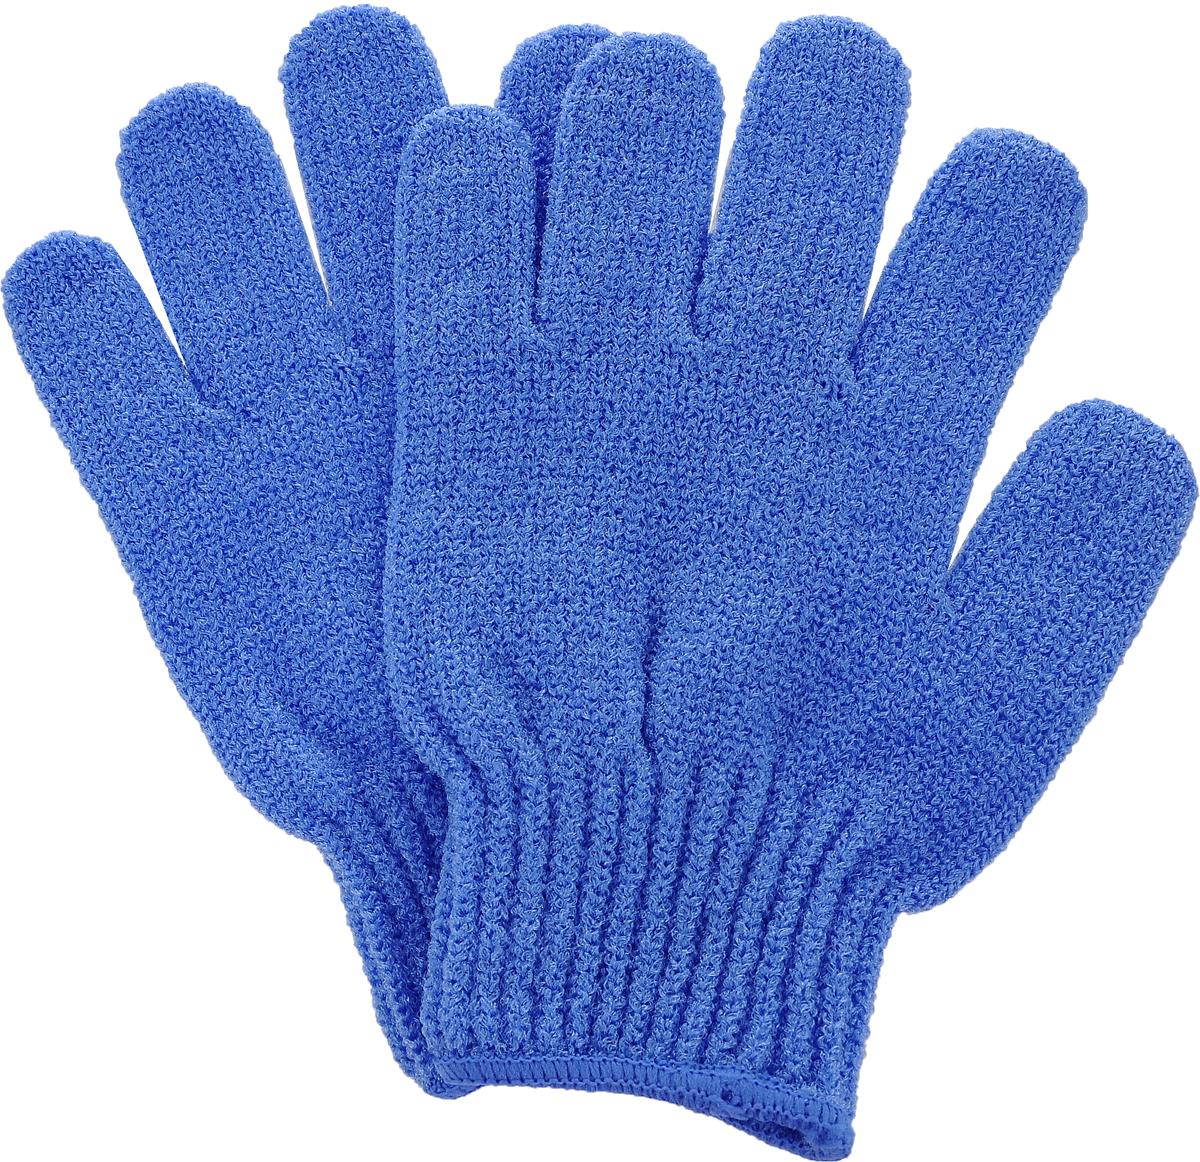 Перчатки для пилинга Riffi, цвет: синий riffi перчатки для пилинга цвет коралловый